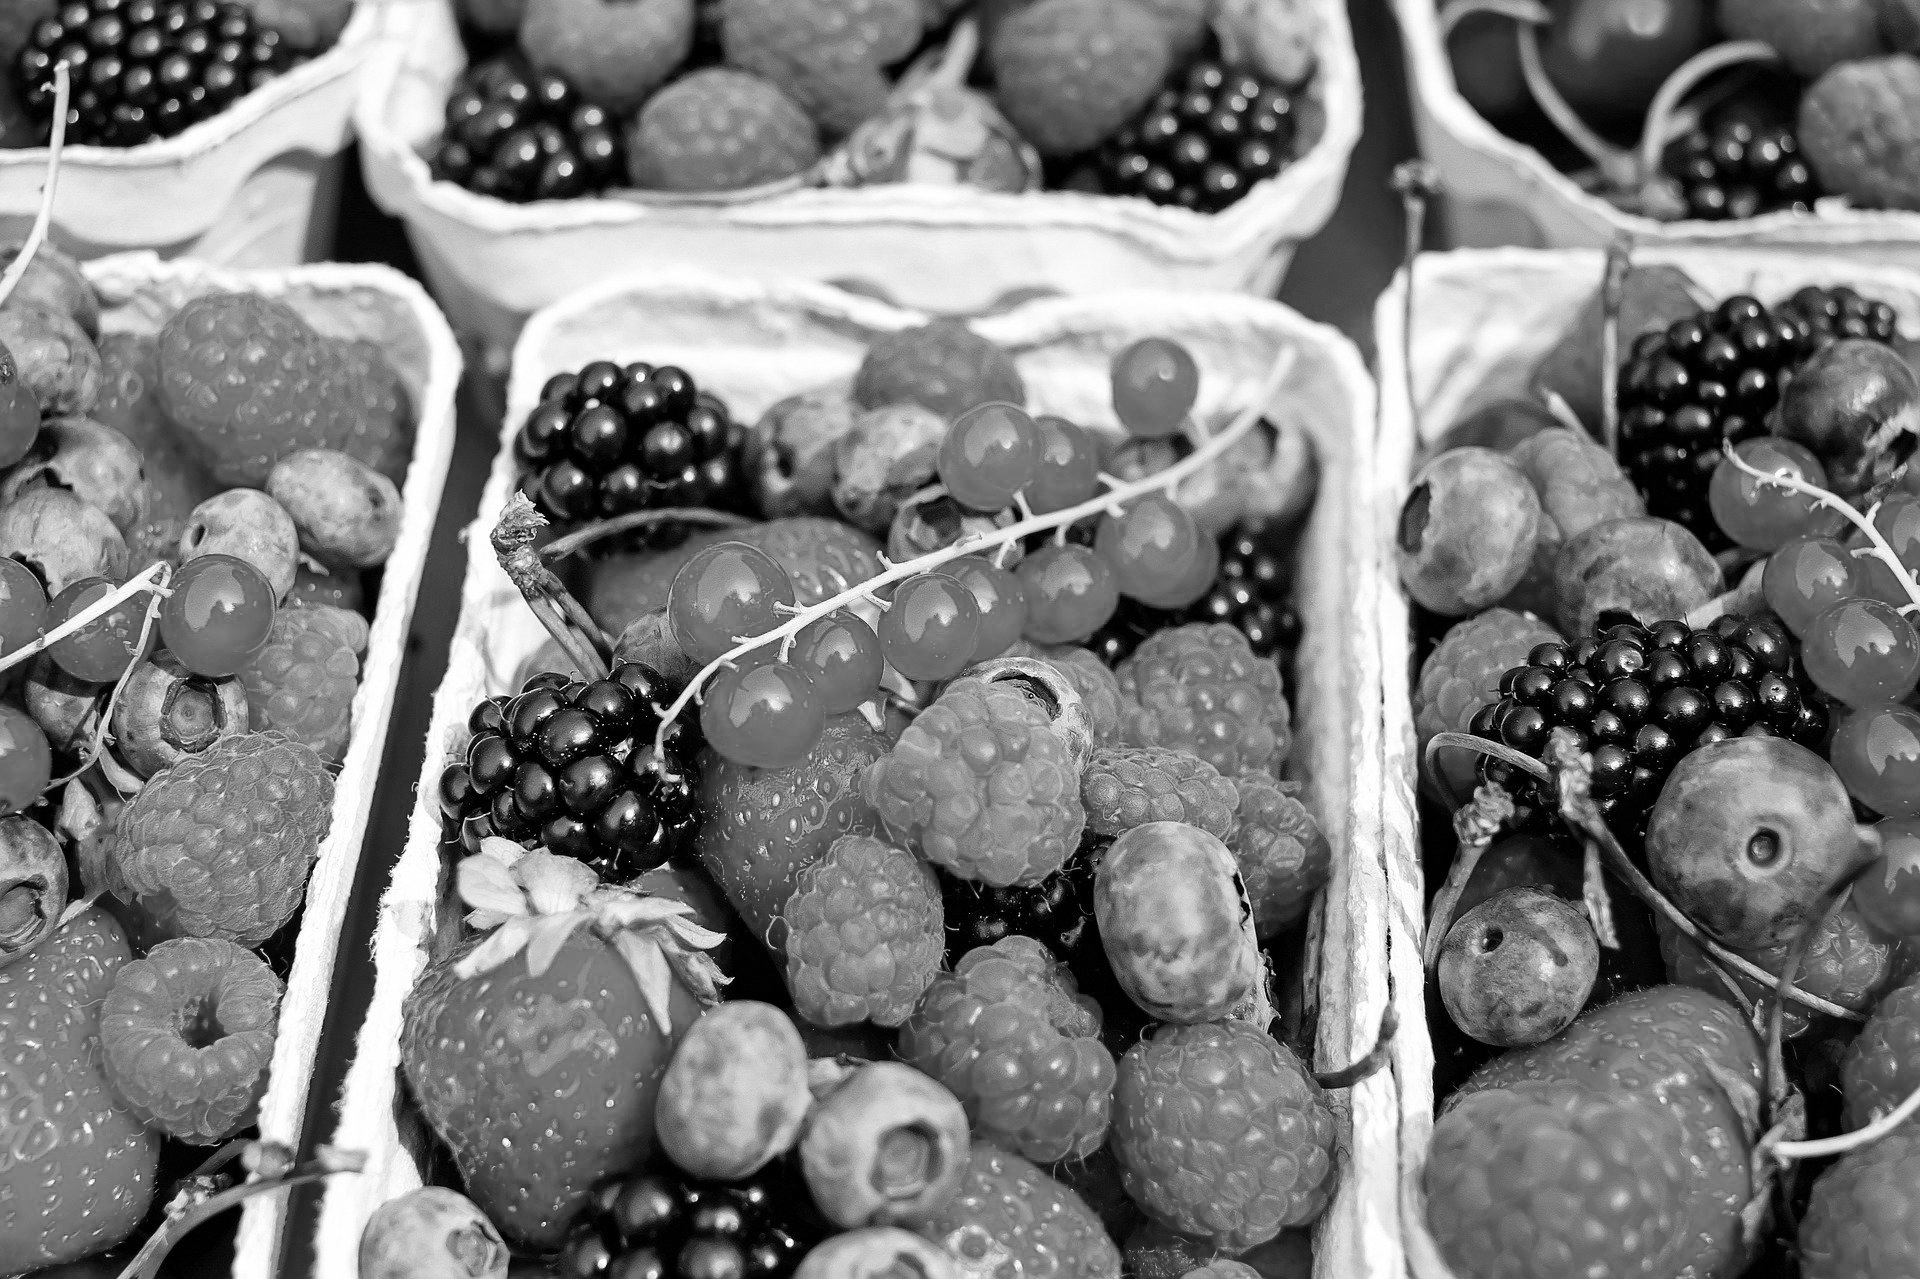 berries-1546125_1920 zw